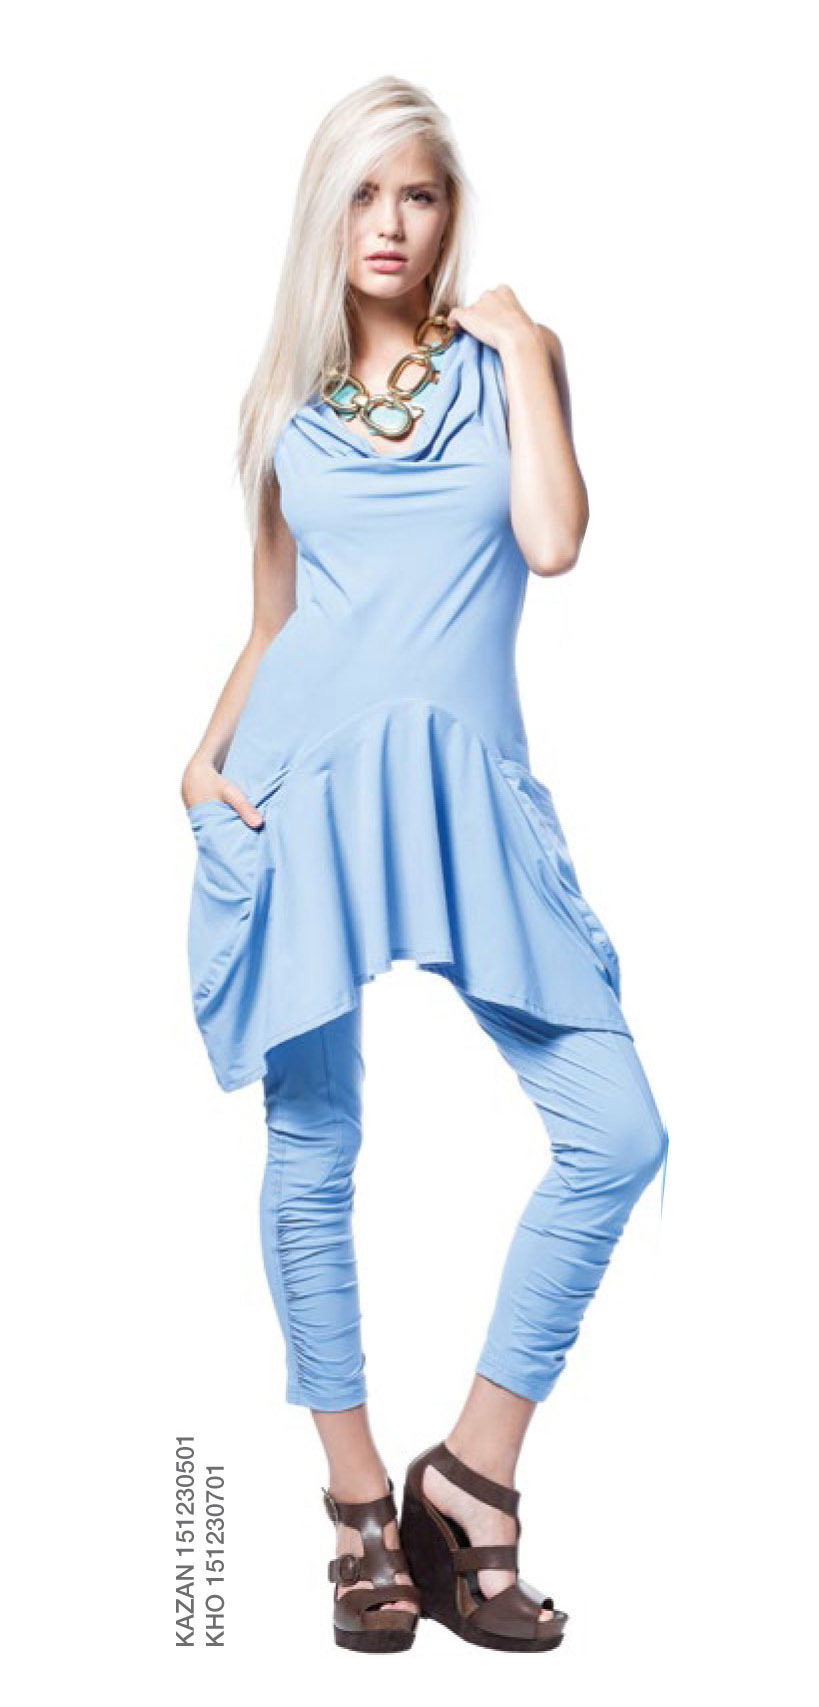 Maloka: Ruched Legging (1 Left in Sky Blue!) MK_KHO_SkyBlue_NEW